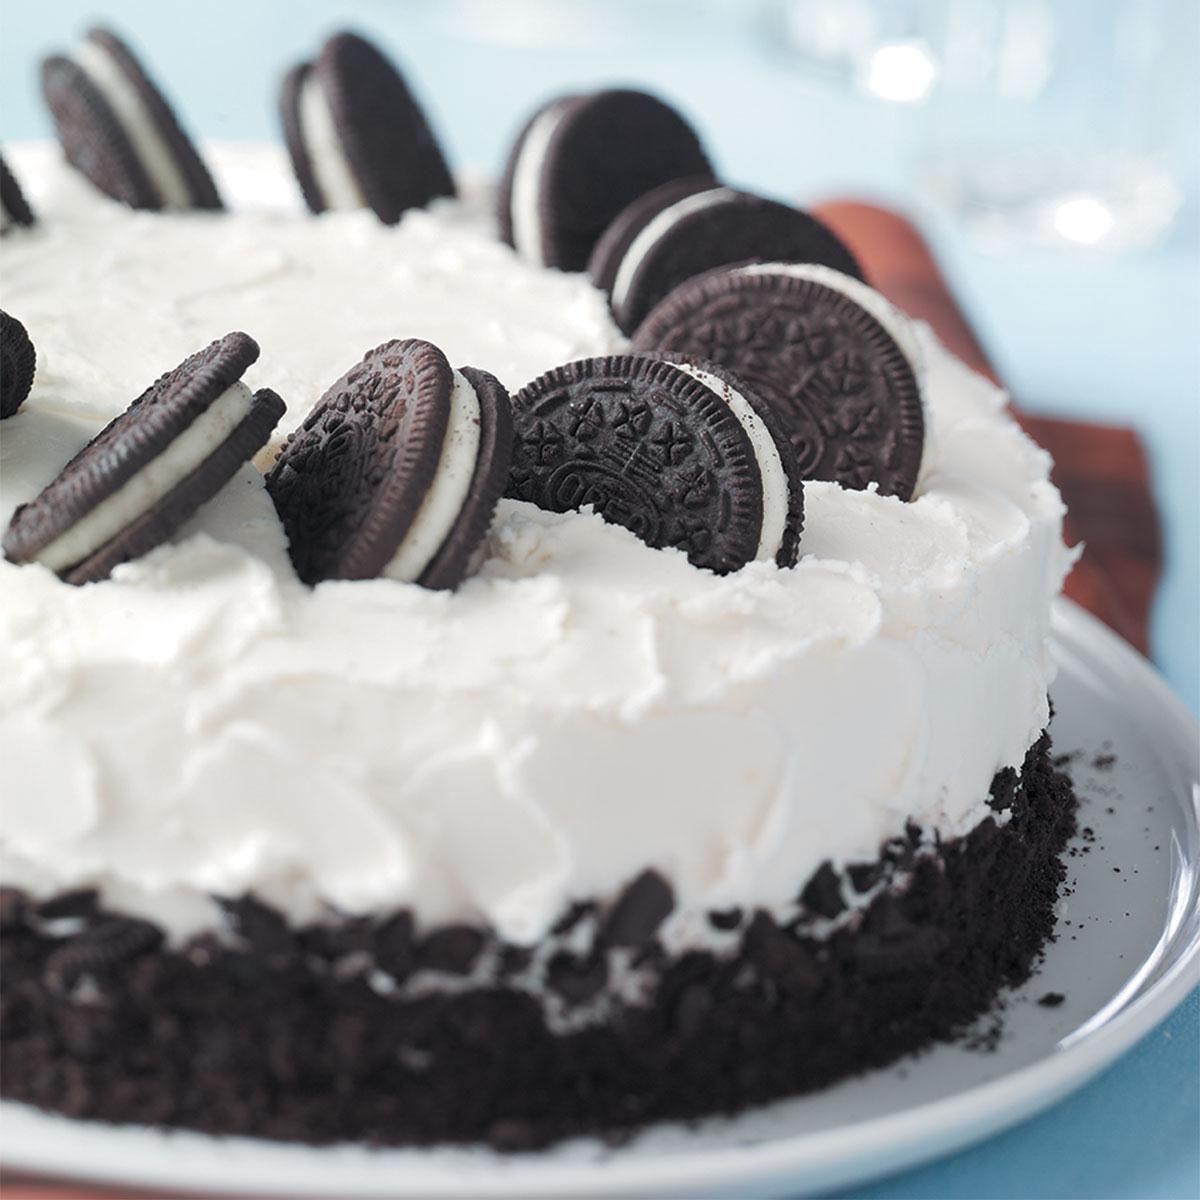 Cookies-and-Cream Cake #cookiesandcreamcake